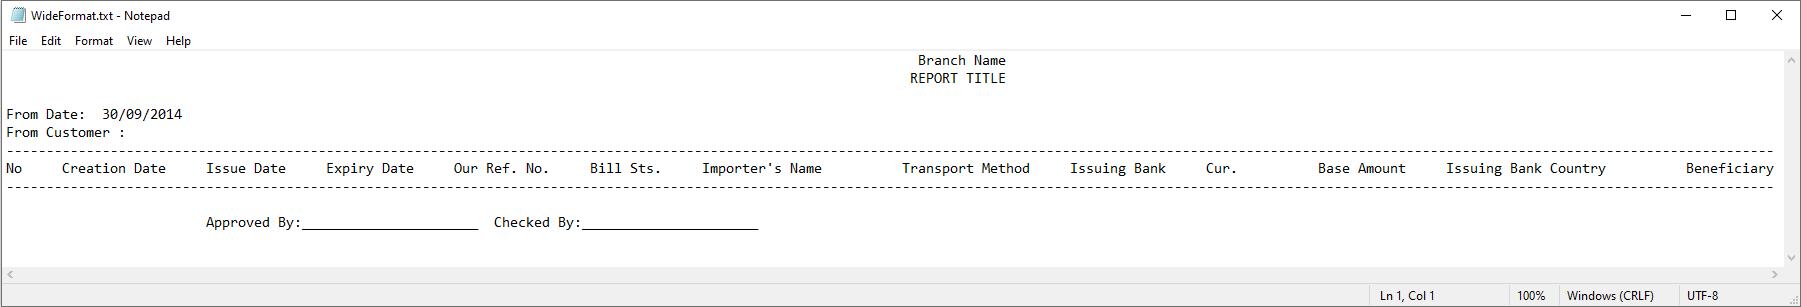 Sample Landscape Text Report